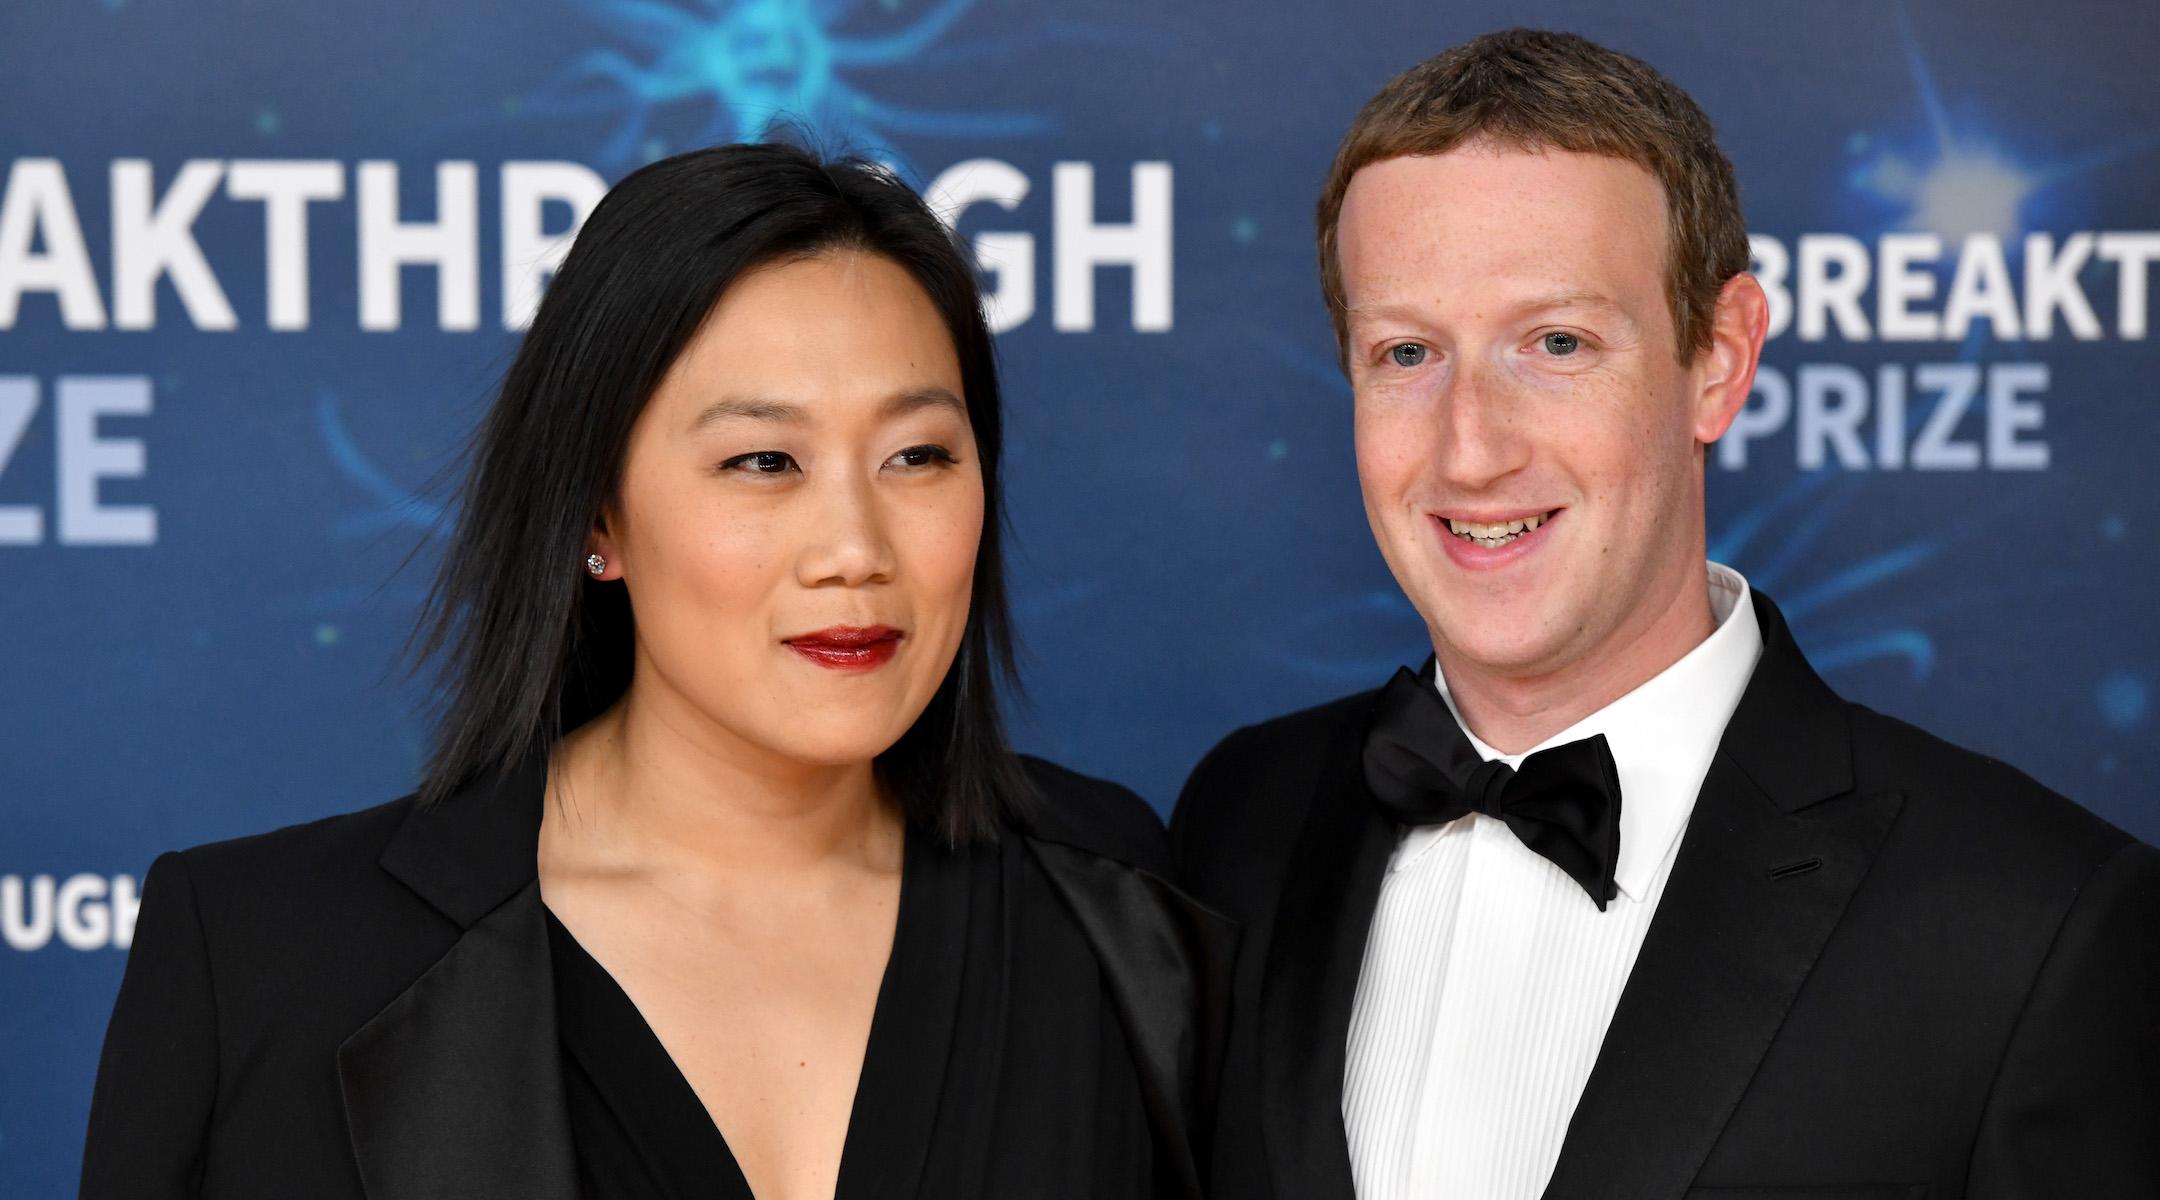 Mark Zuckerberg and Priscilla Chan give $1.3 million to Jewish causes